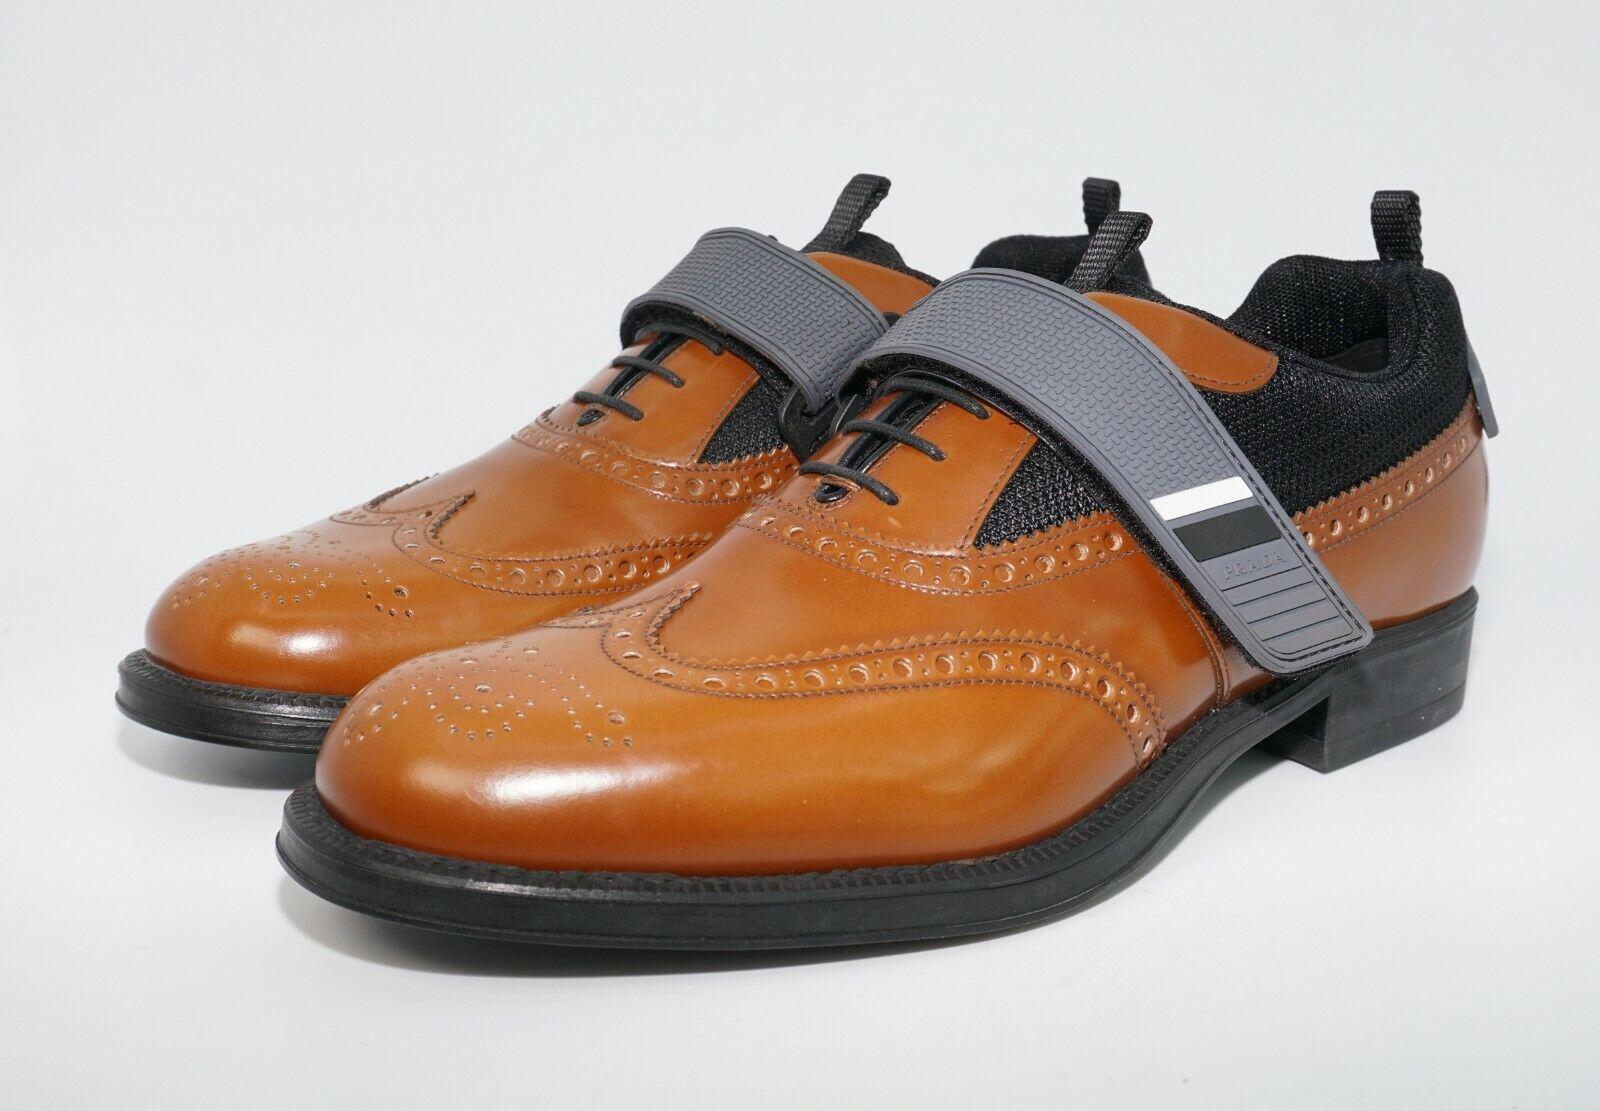 Prada Men's Runway Hybrid Strap Leather Brogue Wingtip Oxfords, Marronee, MSRP  820